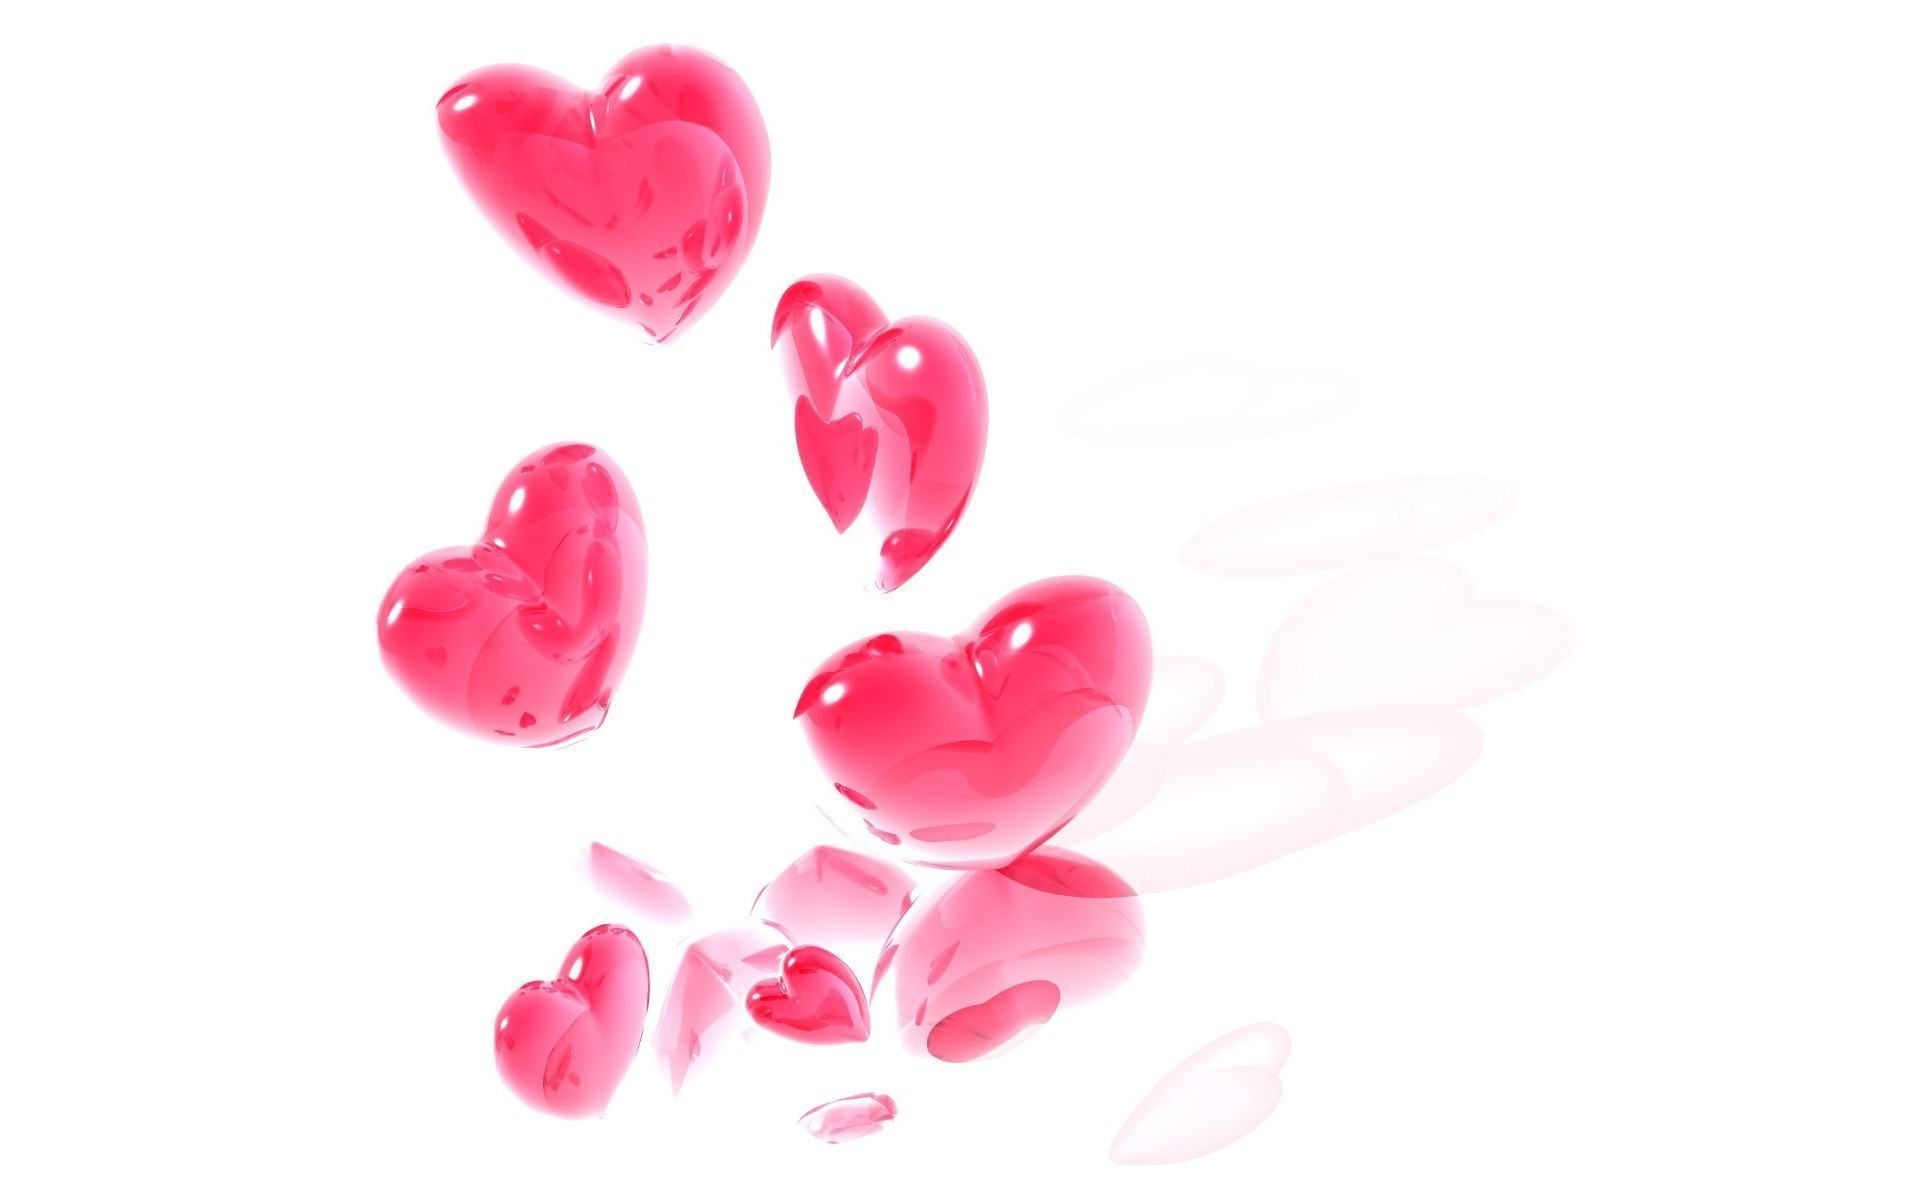 Top Pink Heart Wallpaper Background Wallpapers